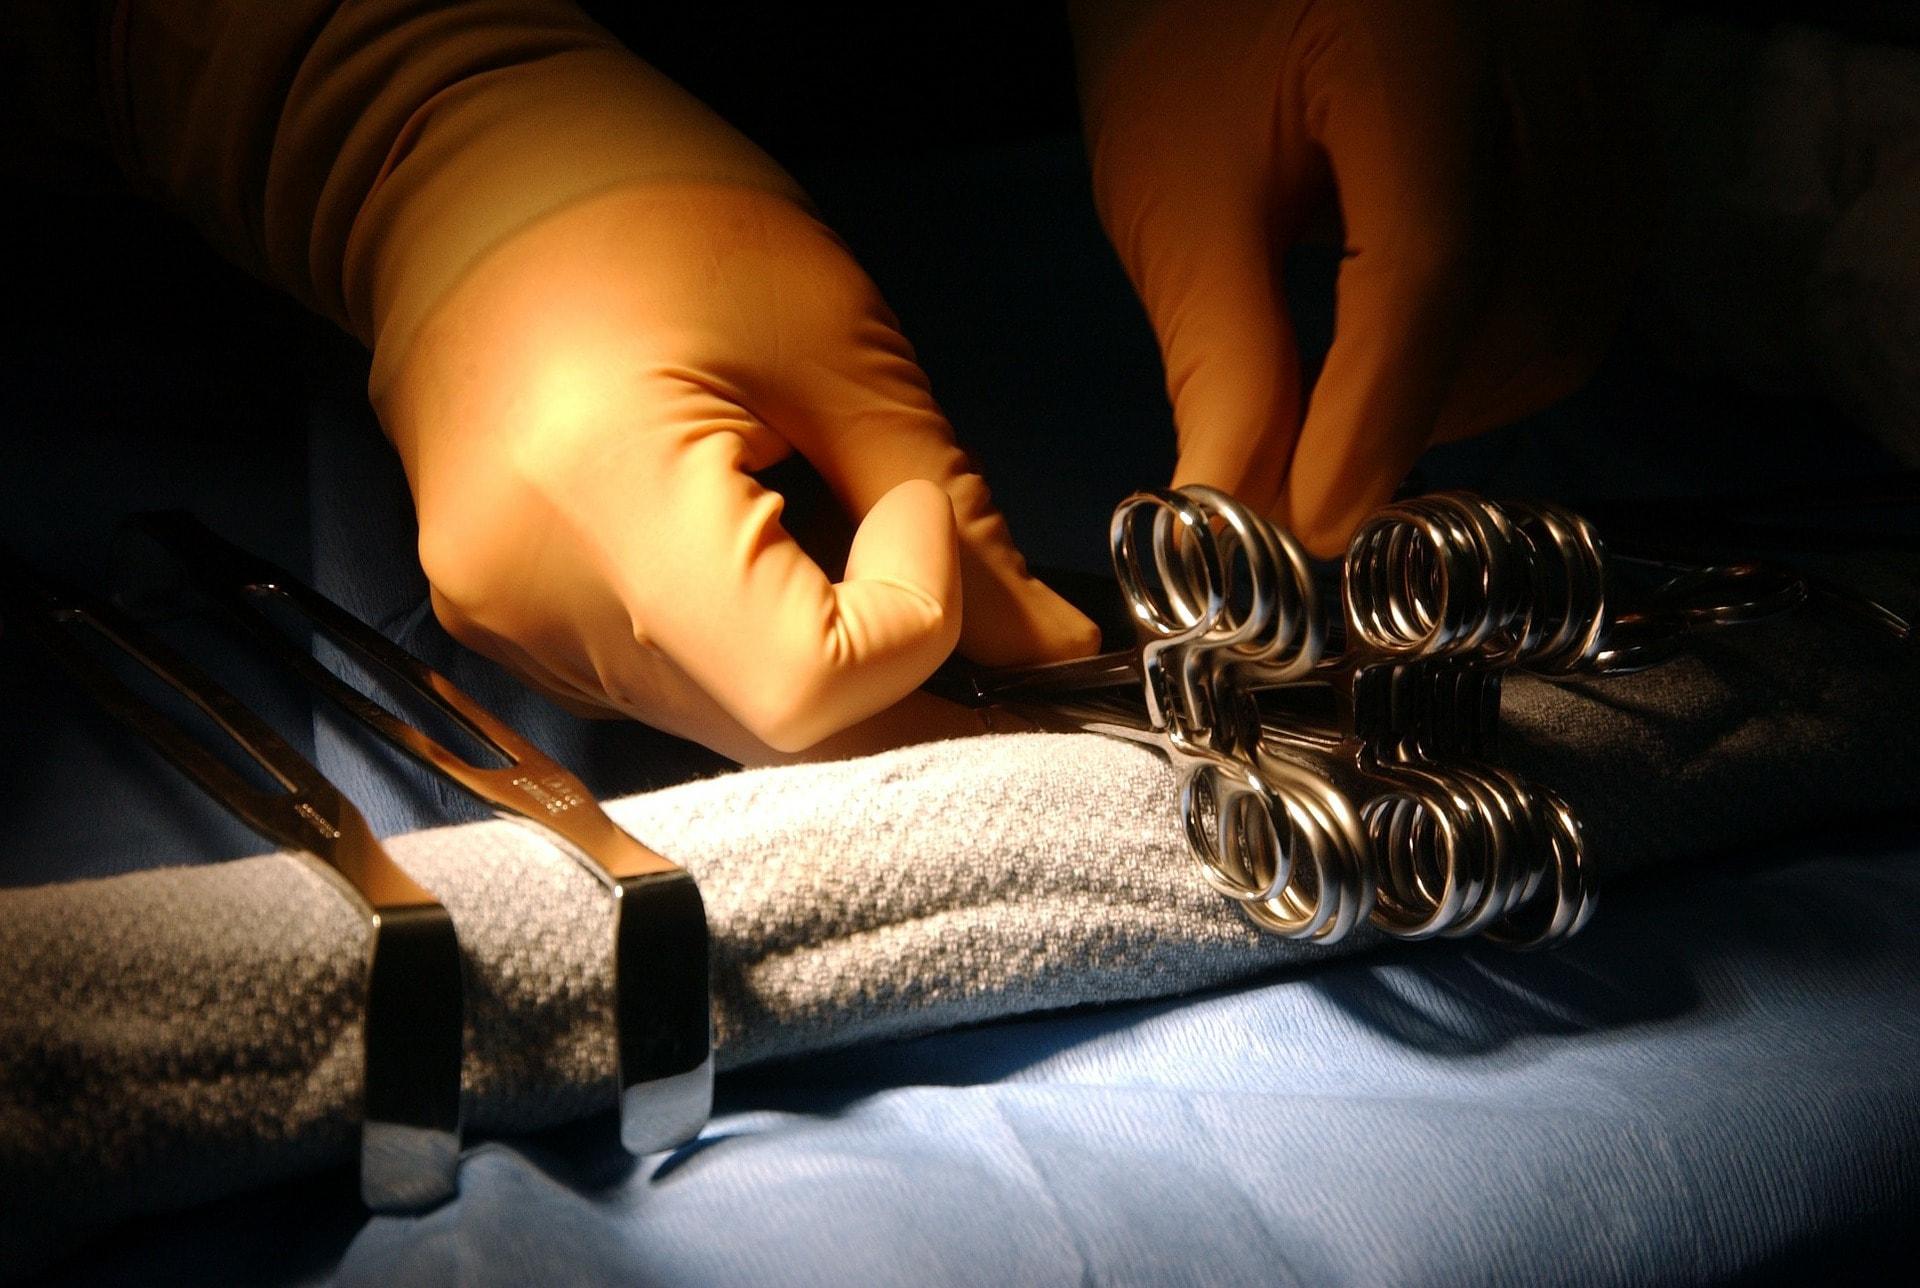 ketamine for chronic pain post-surgery